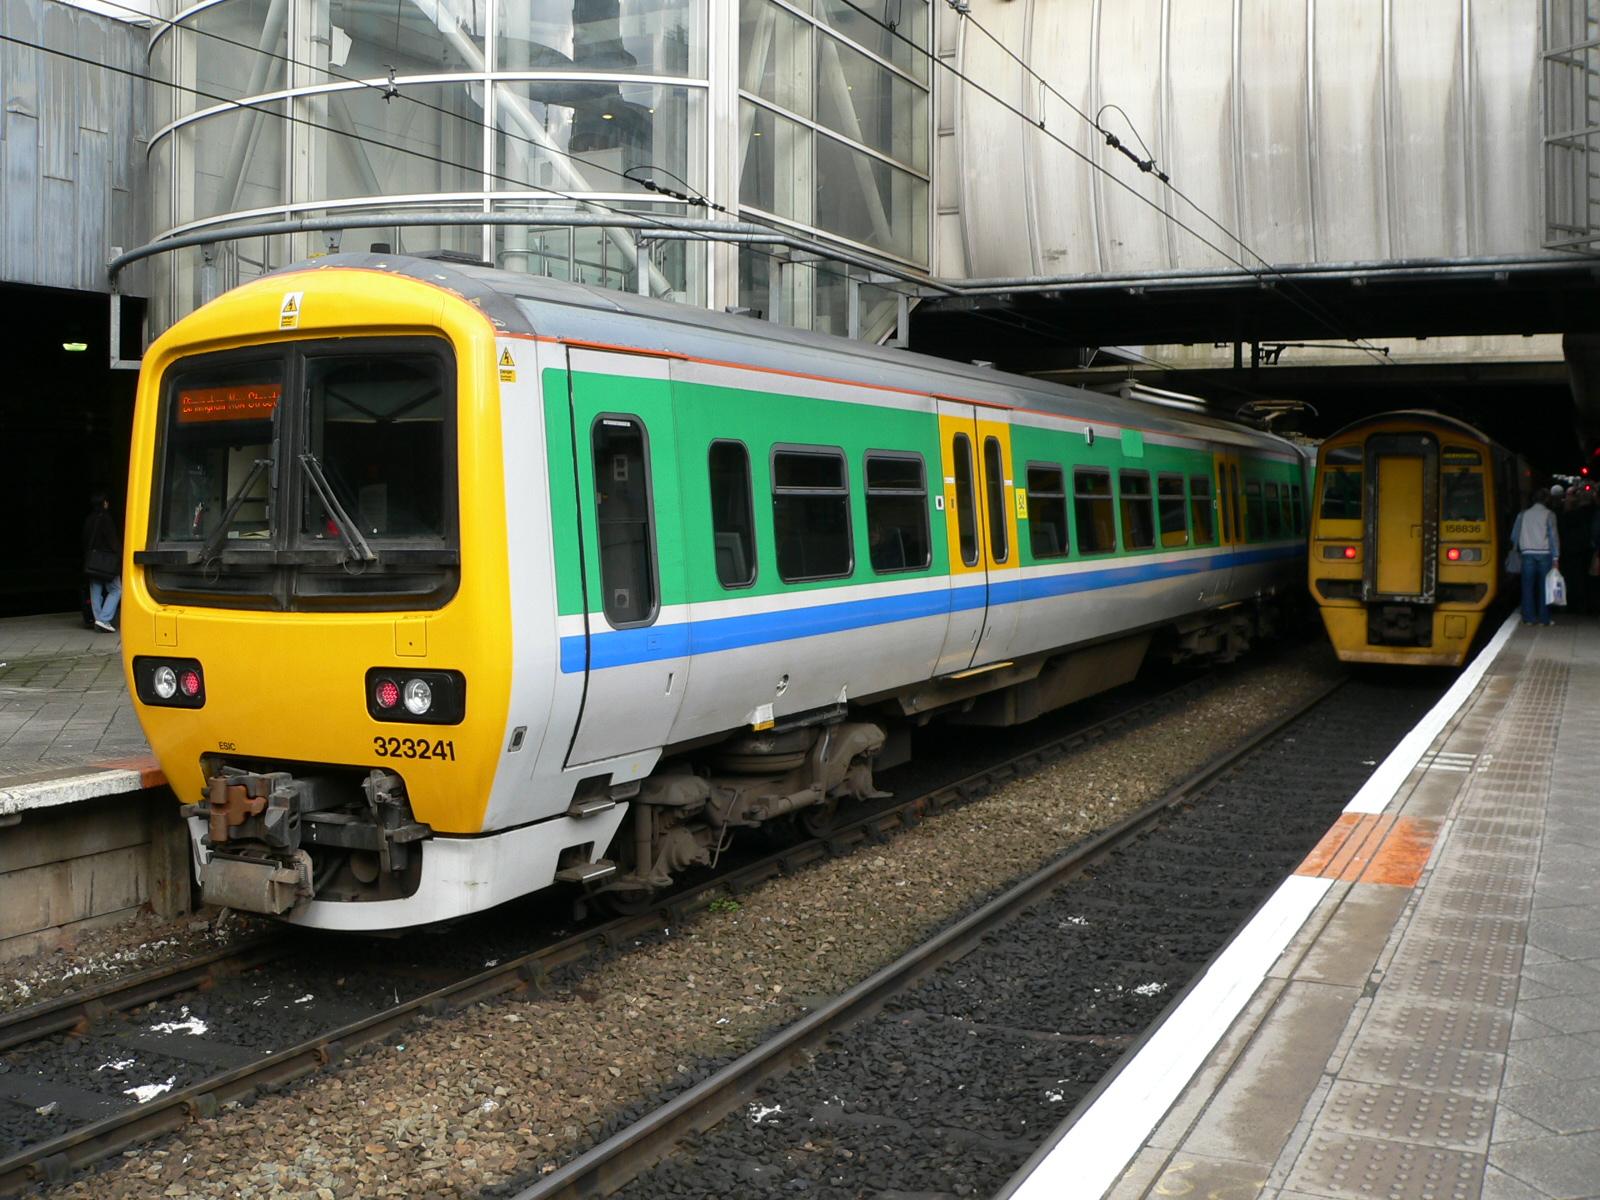 Train from birmingham to new york city